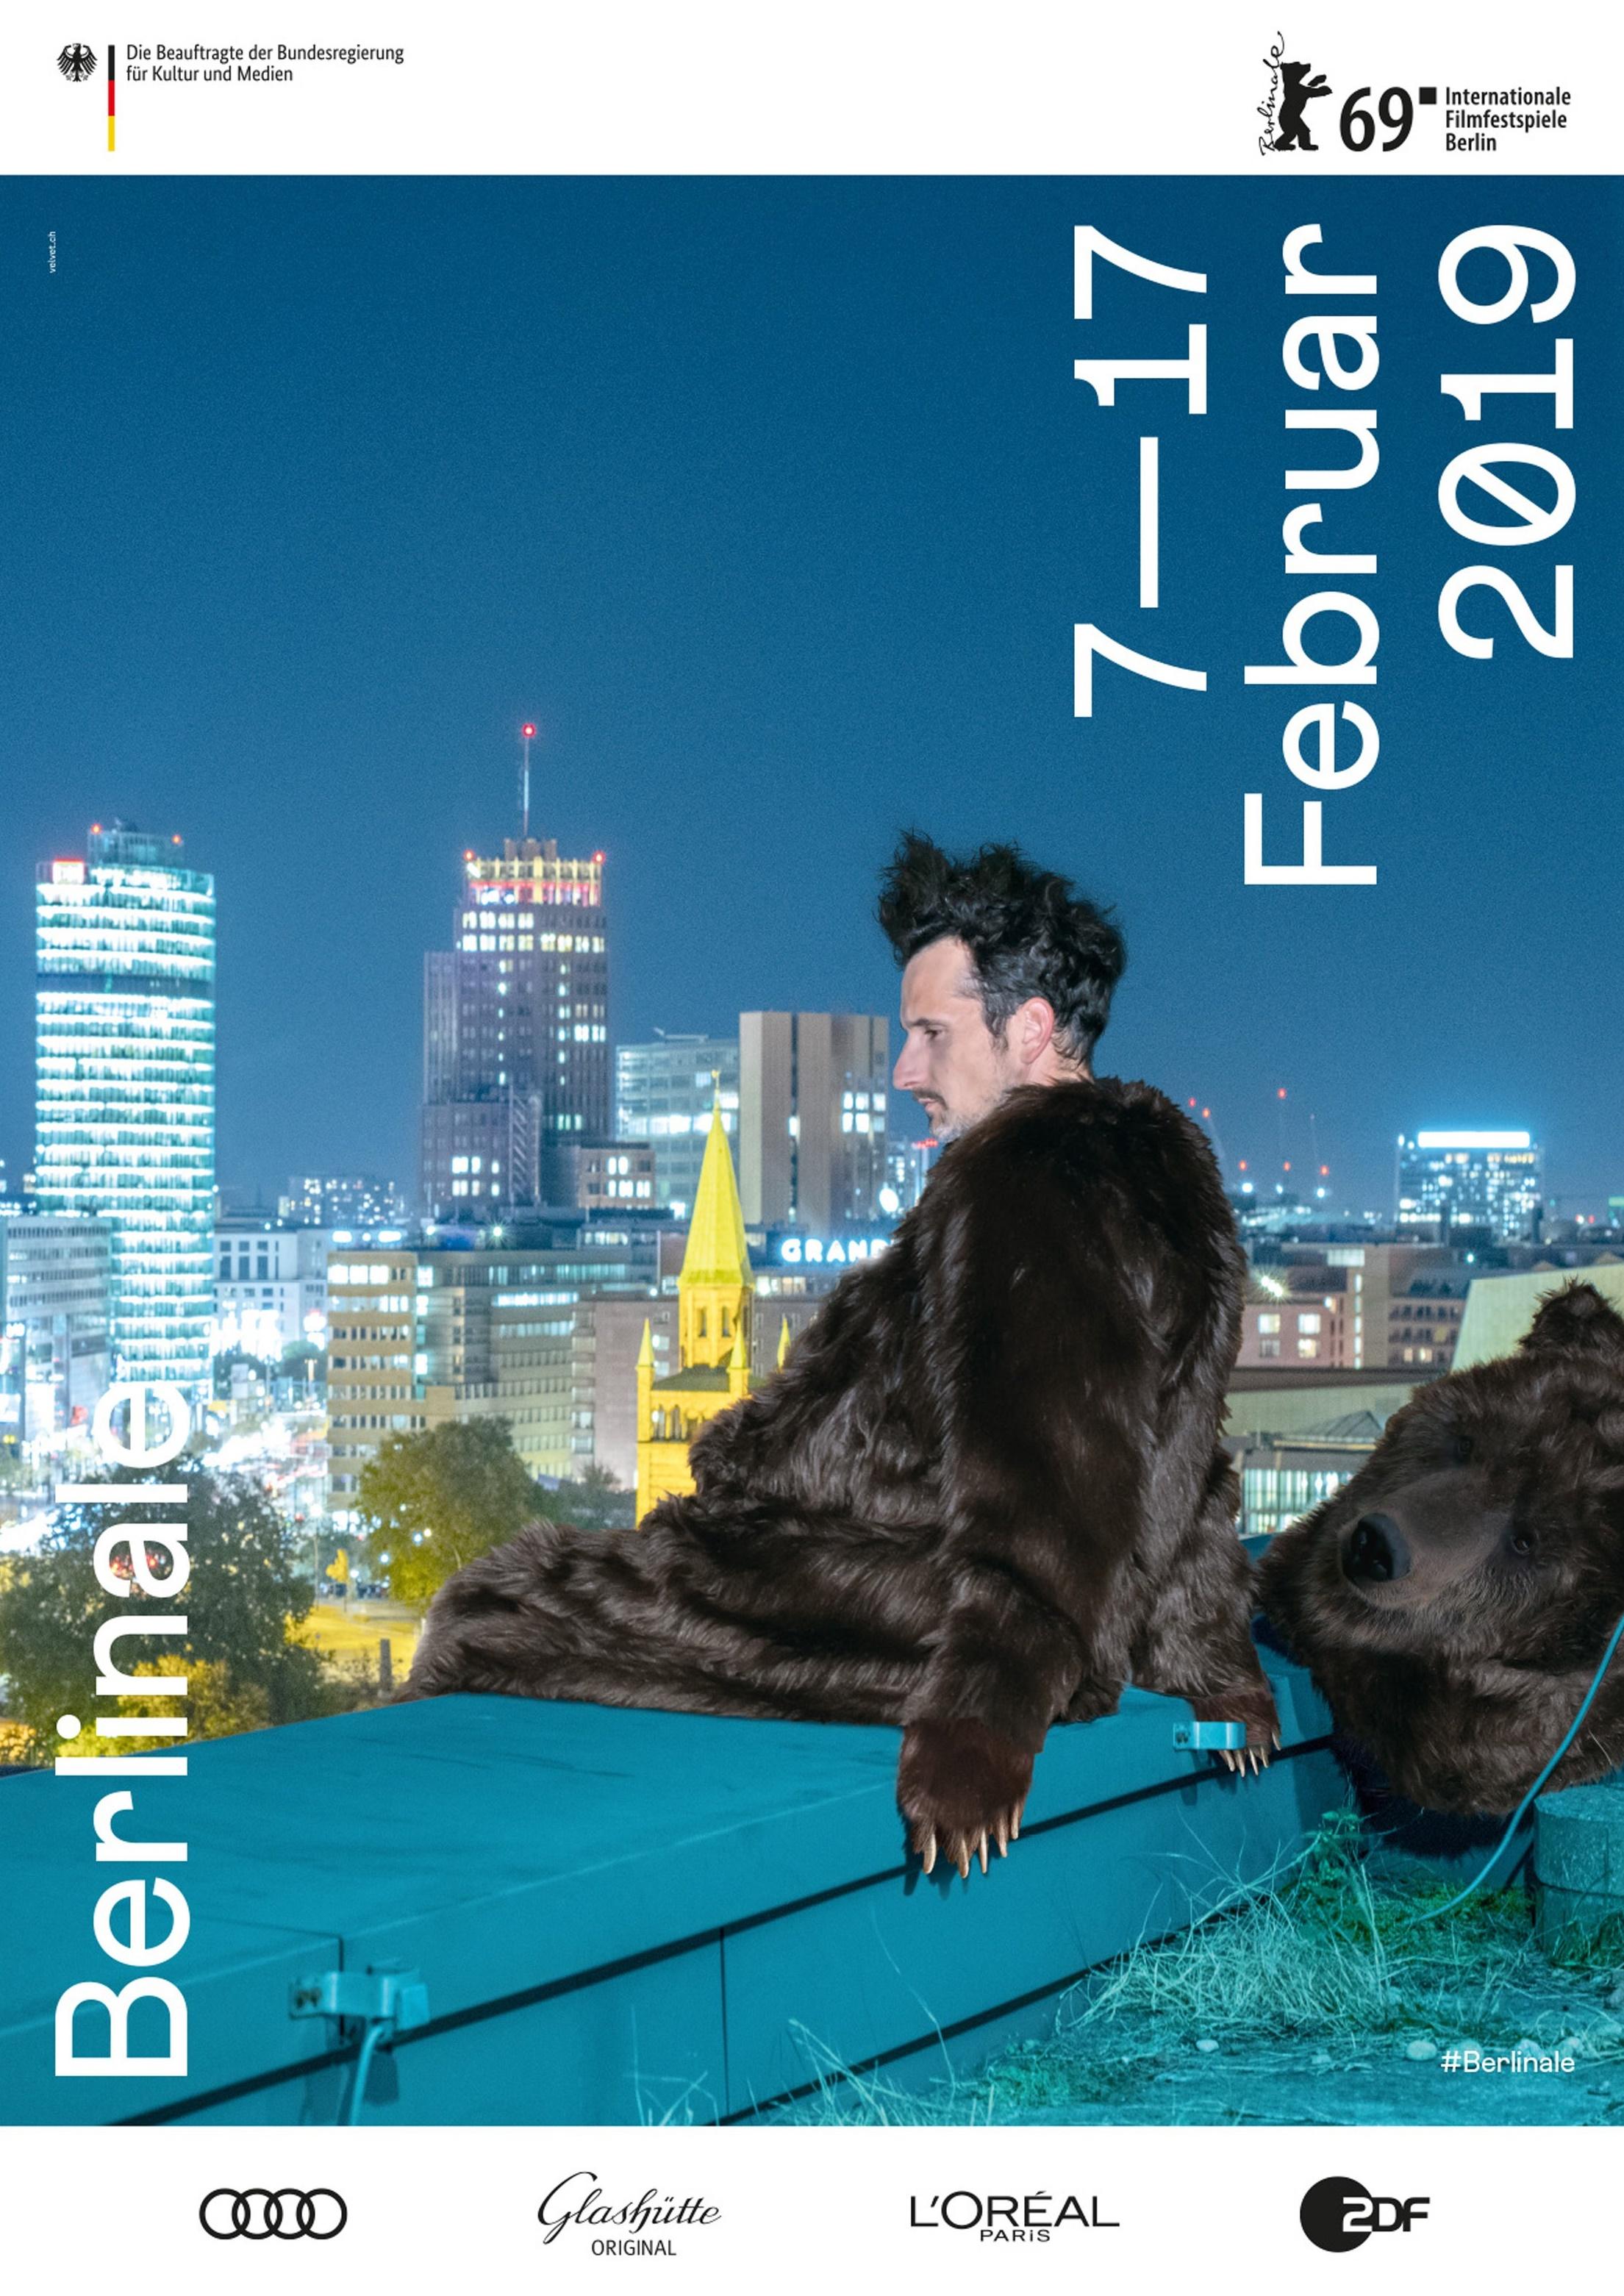 Festival de Berlin 2019 section Generation affiche